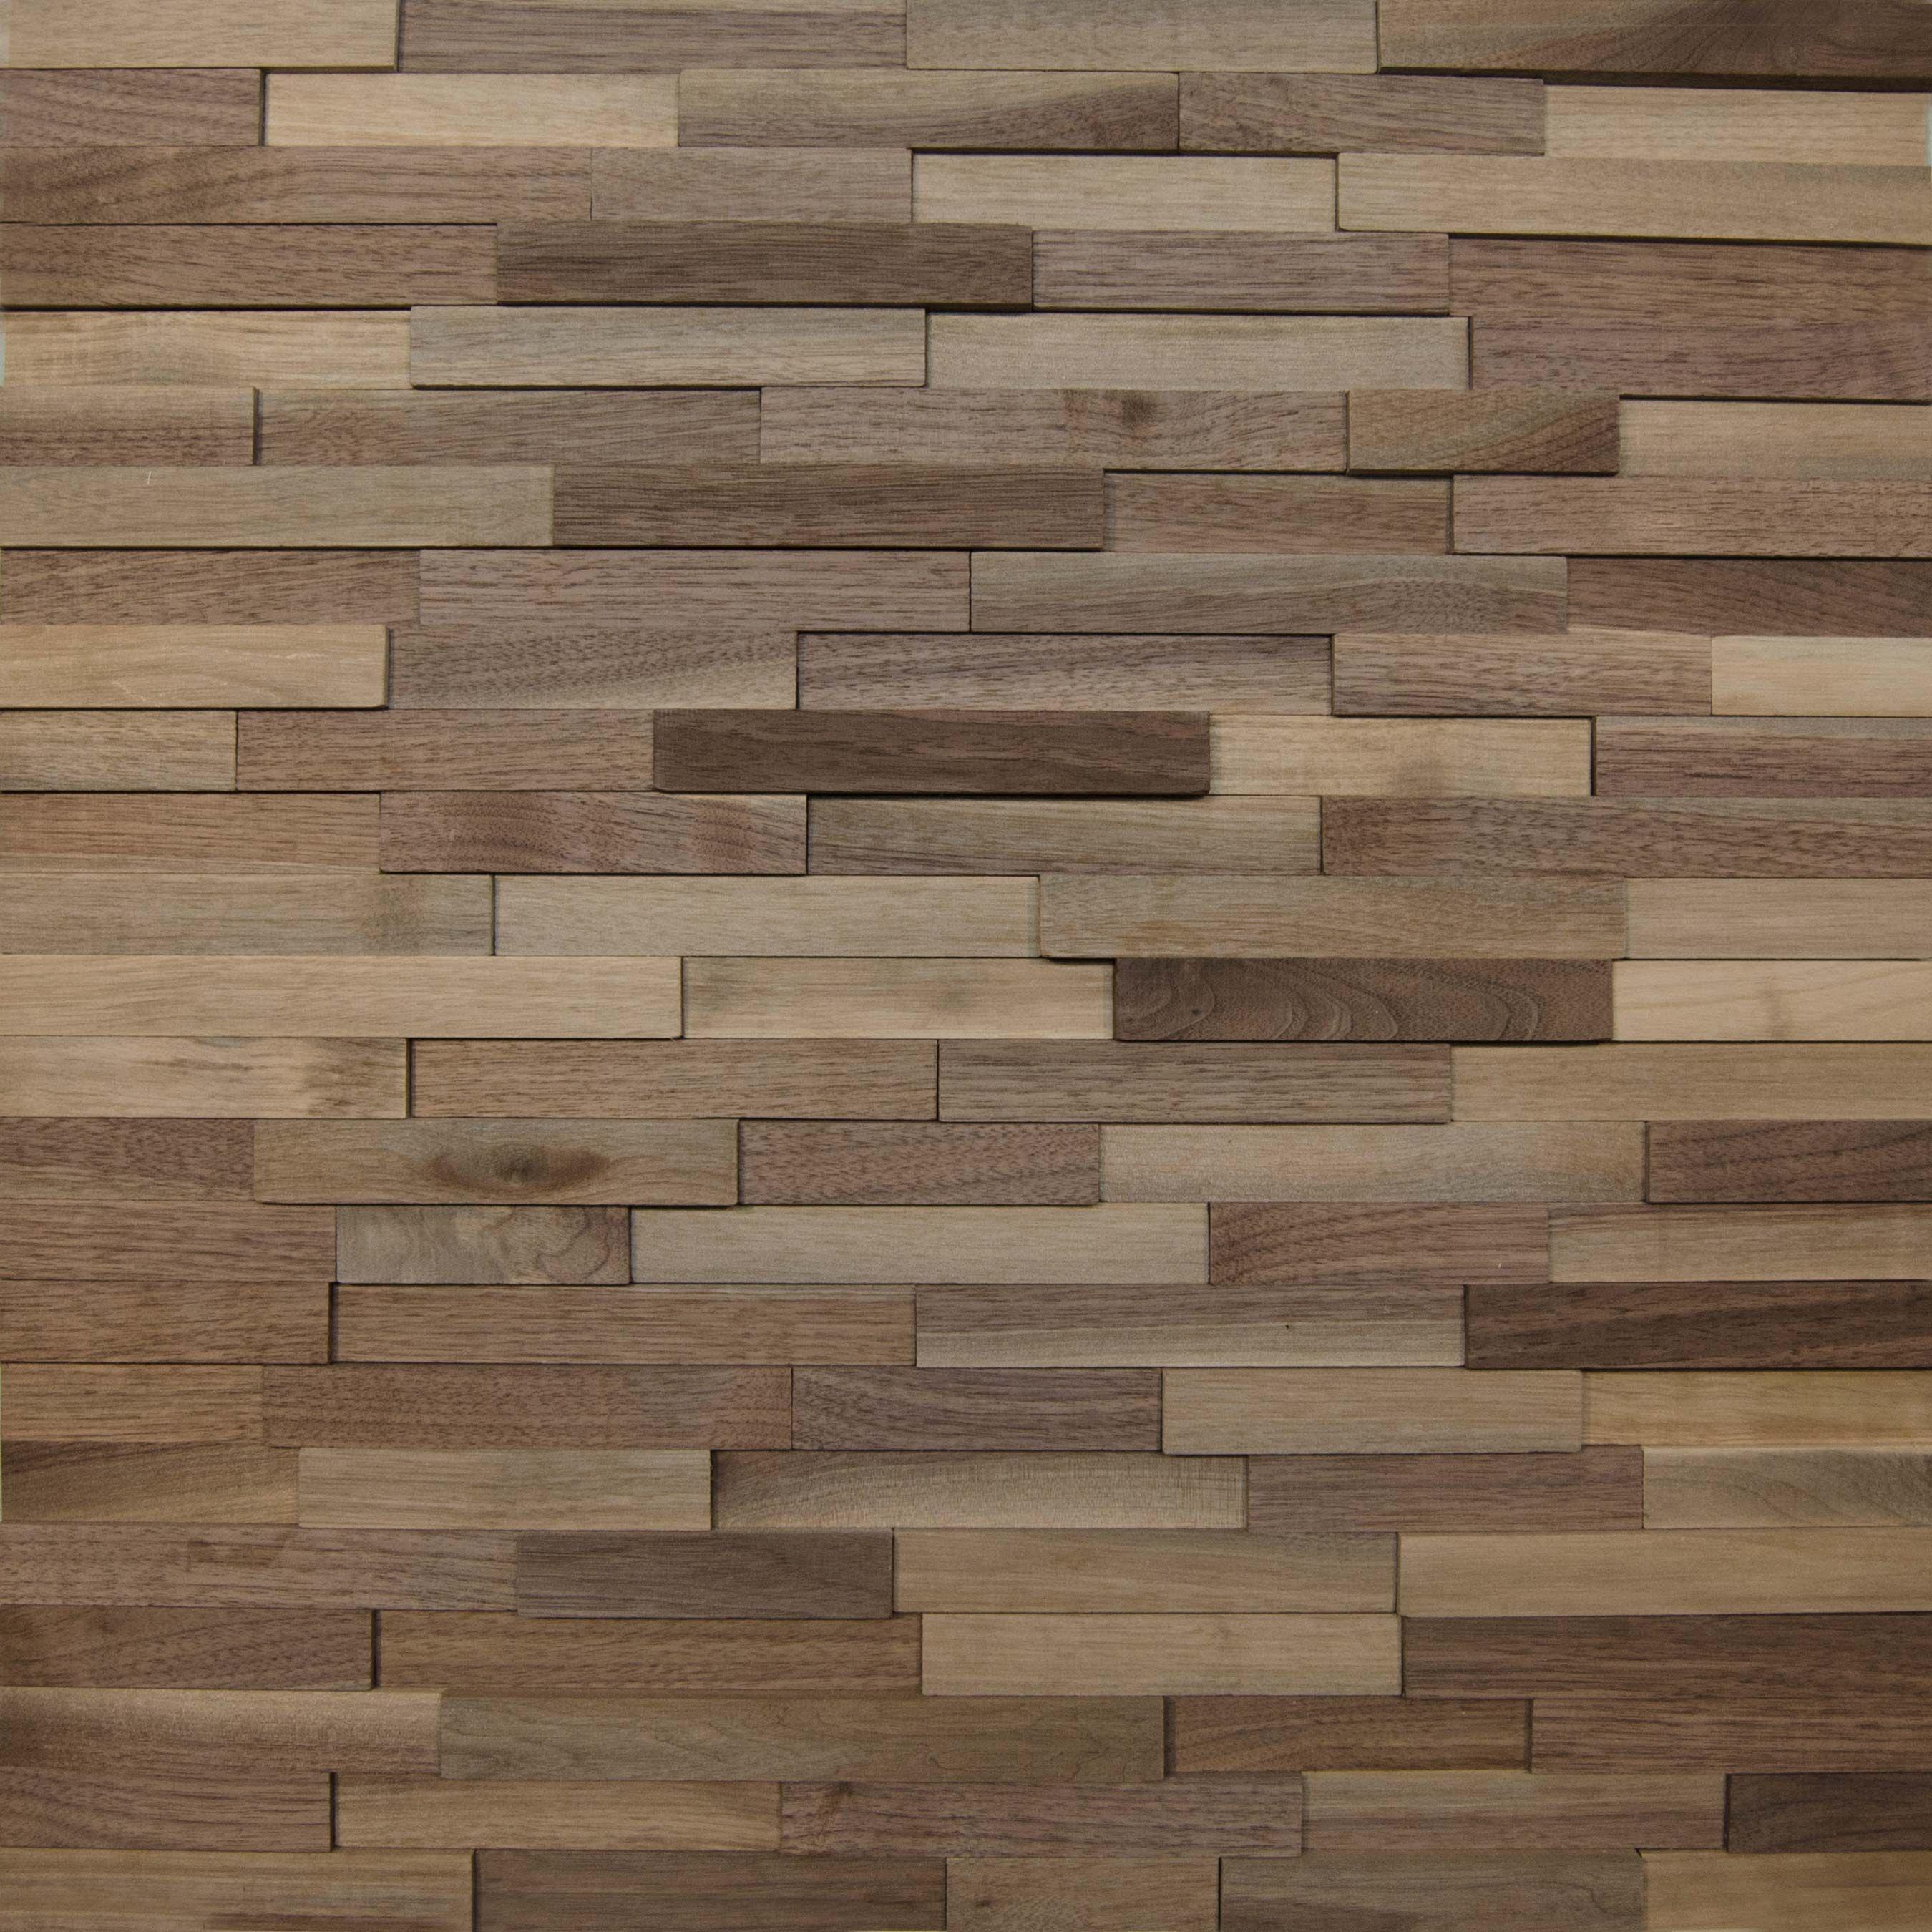 Wallure Striped - Walnut - Narrow - Sleek - Natural Wooden ...